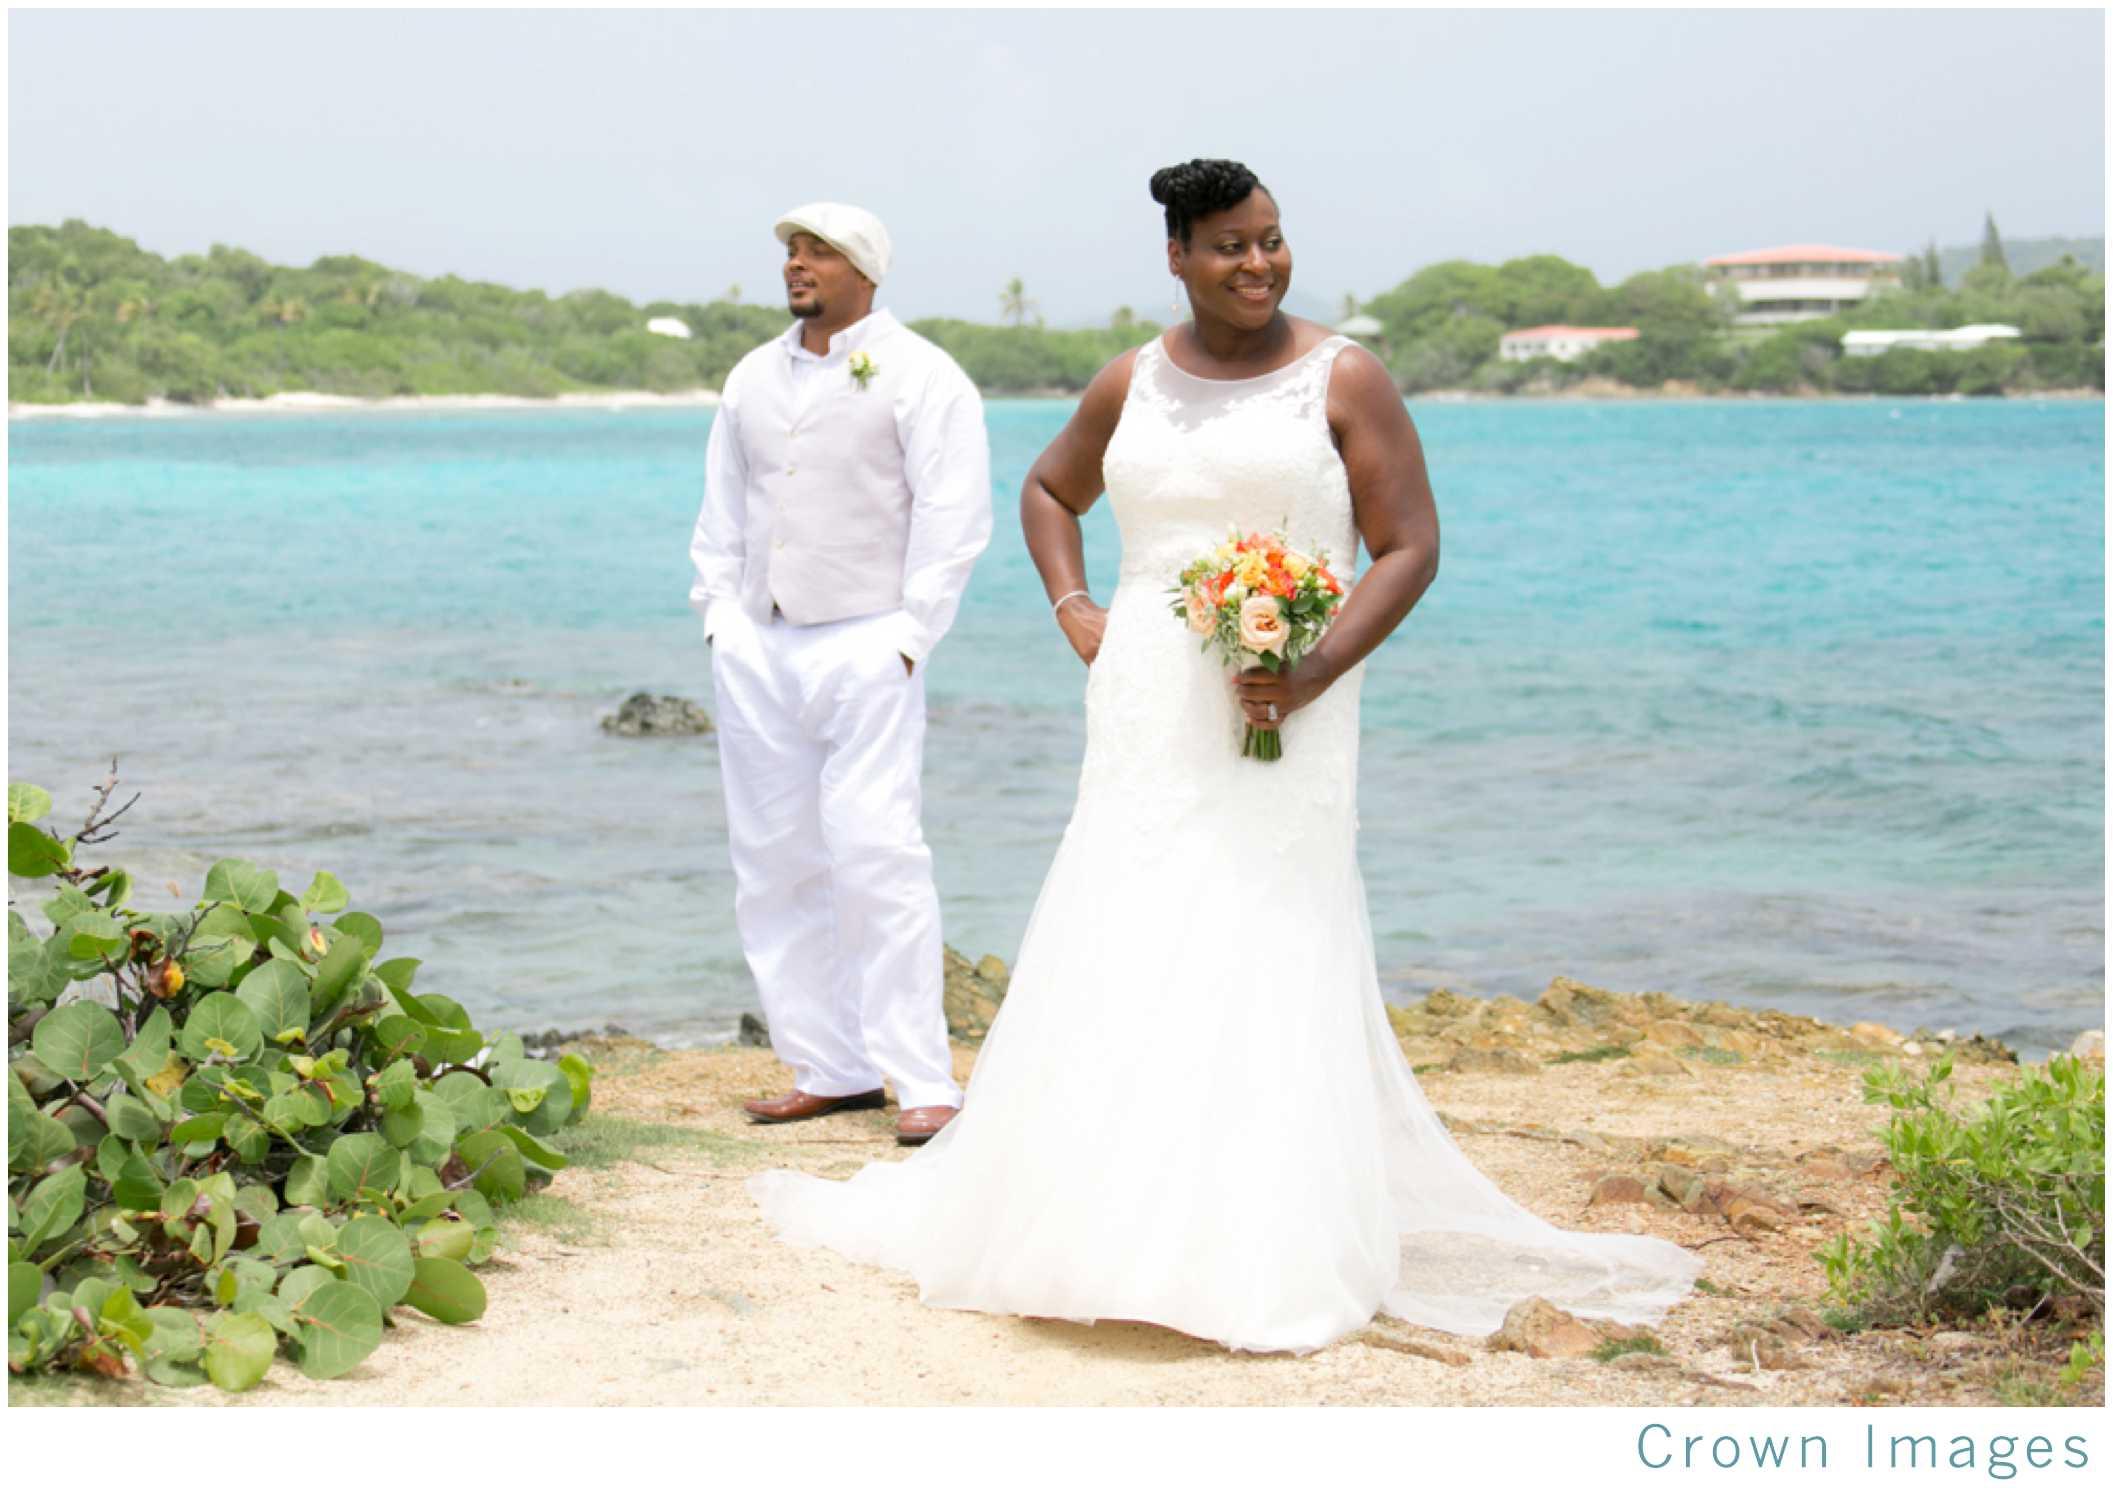 st-thomas-wedding-photos_1991.jpg